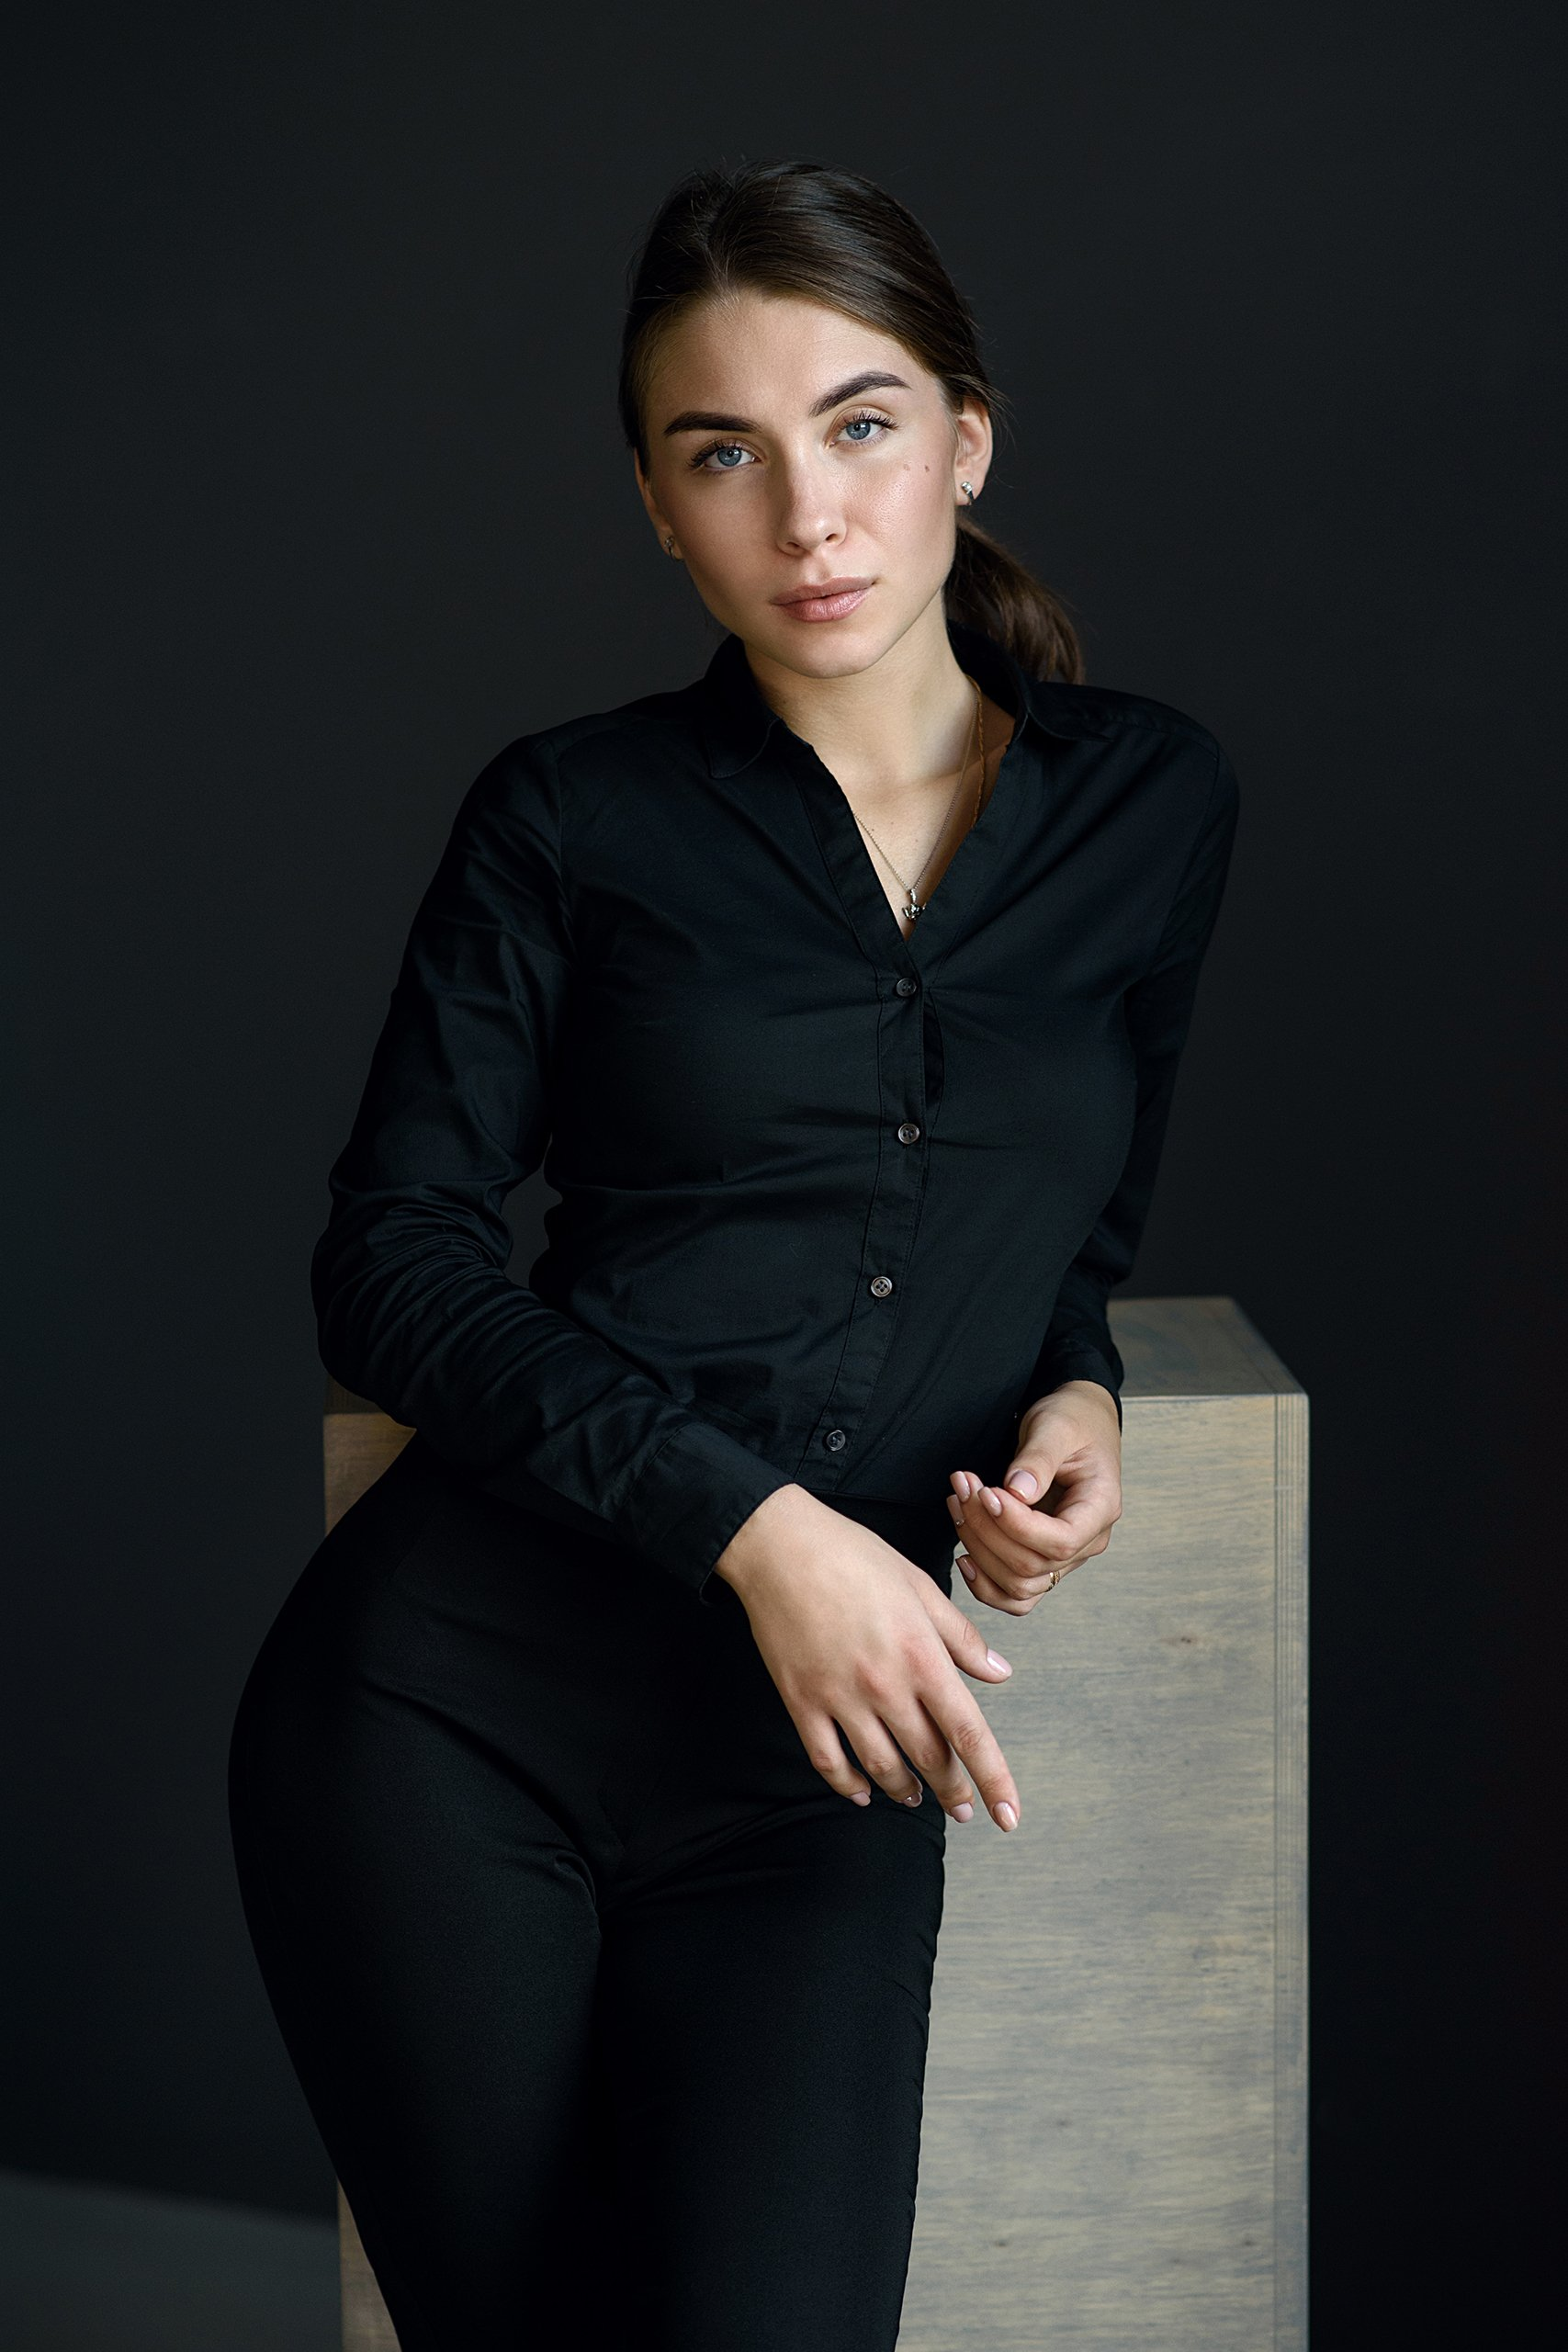 портрет, portrait, nikon, Russia, Александр Макушин